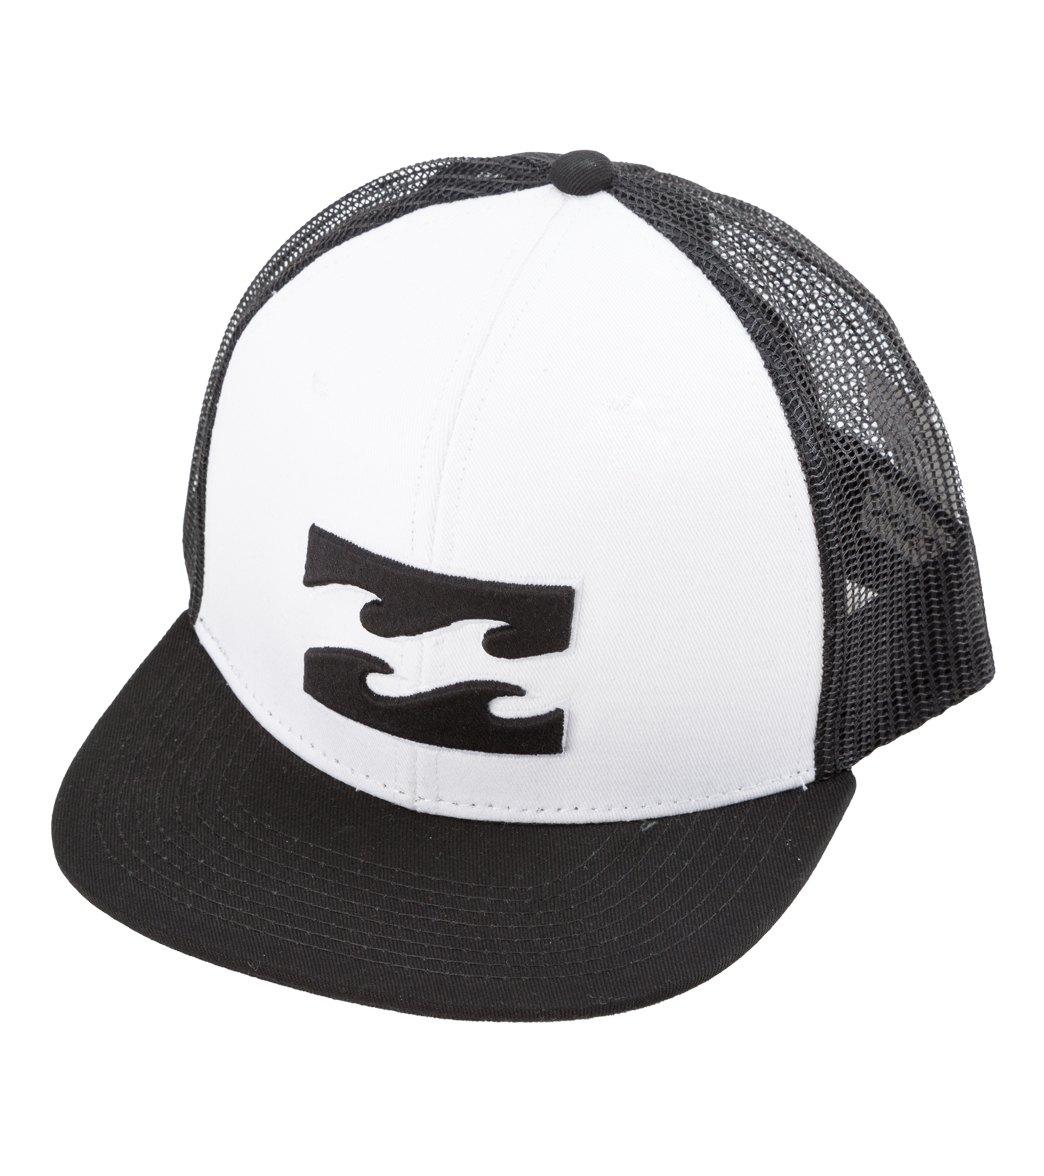 a6b2ebc9df3 Billabong Boys  All Day Trucker Hat at SwimOutlet.com